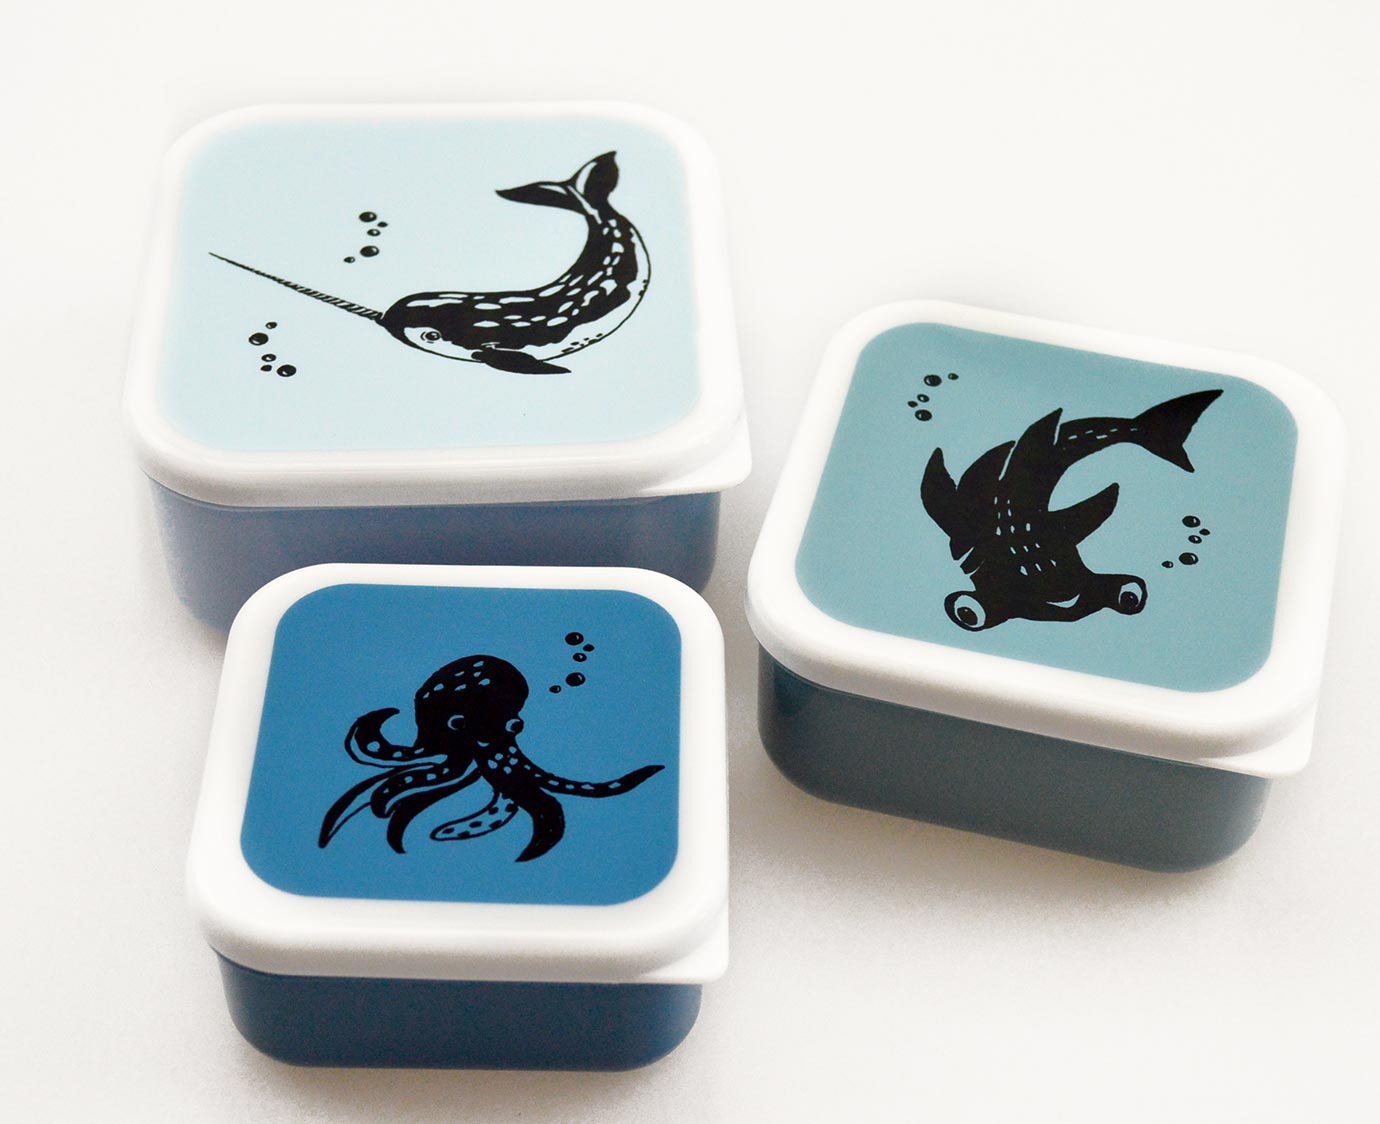 Snackdoosjes 'Sea animals'